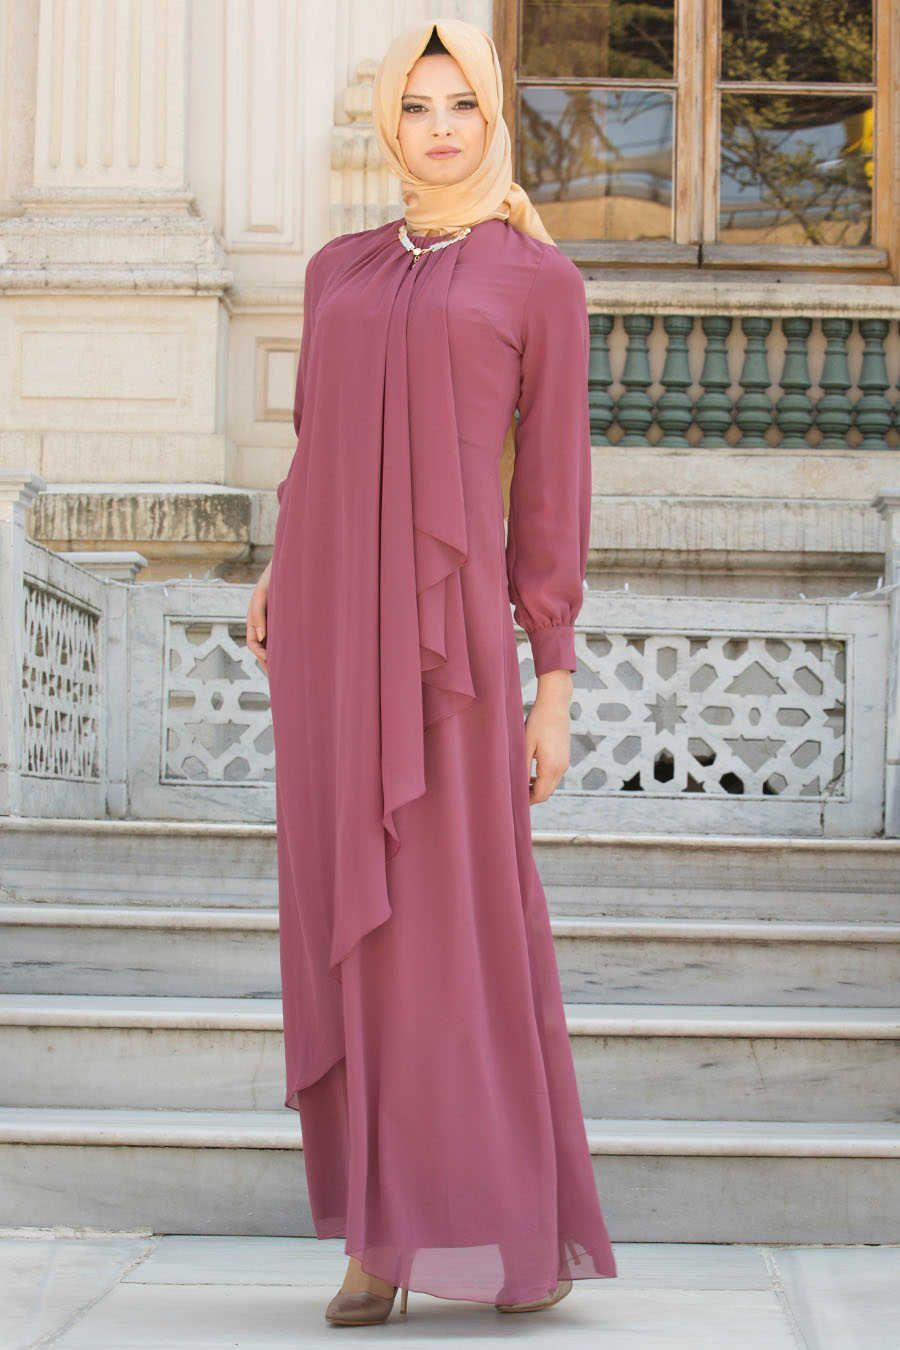 81a3587e6f80 Neva Style - Dusty Rose Hijab Evening Dress 52547GK in 2019   Mom's ...